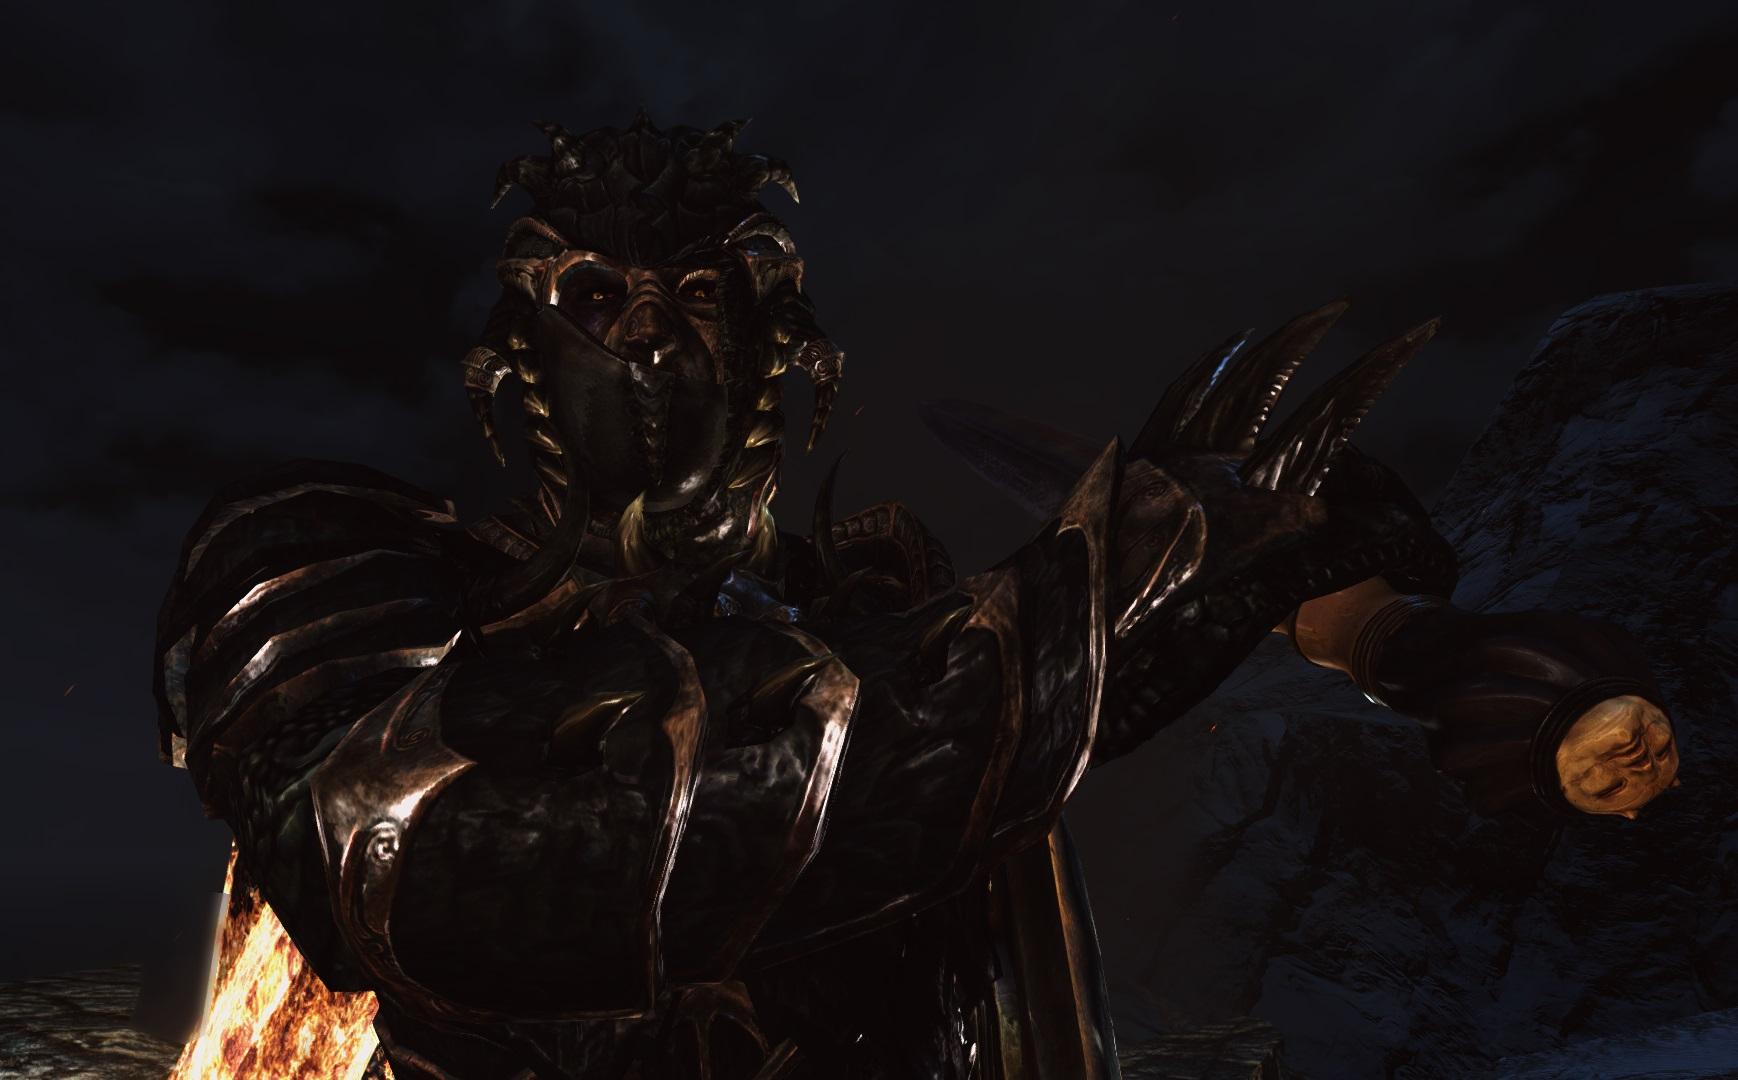 Boe - The Elder Scrolls 5: Skyrim